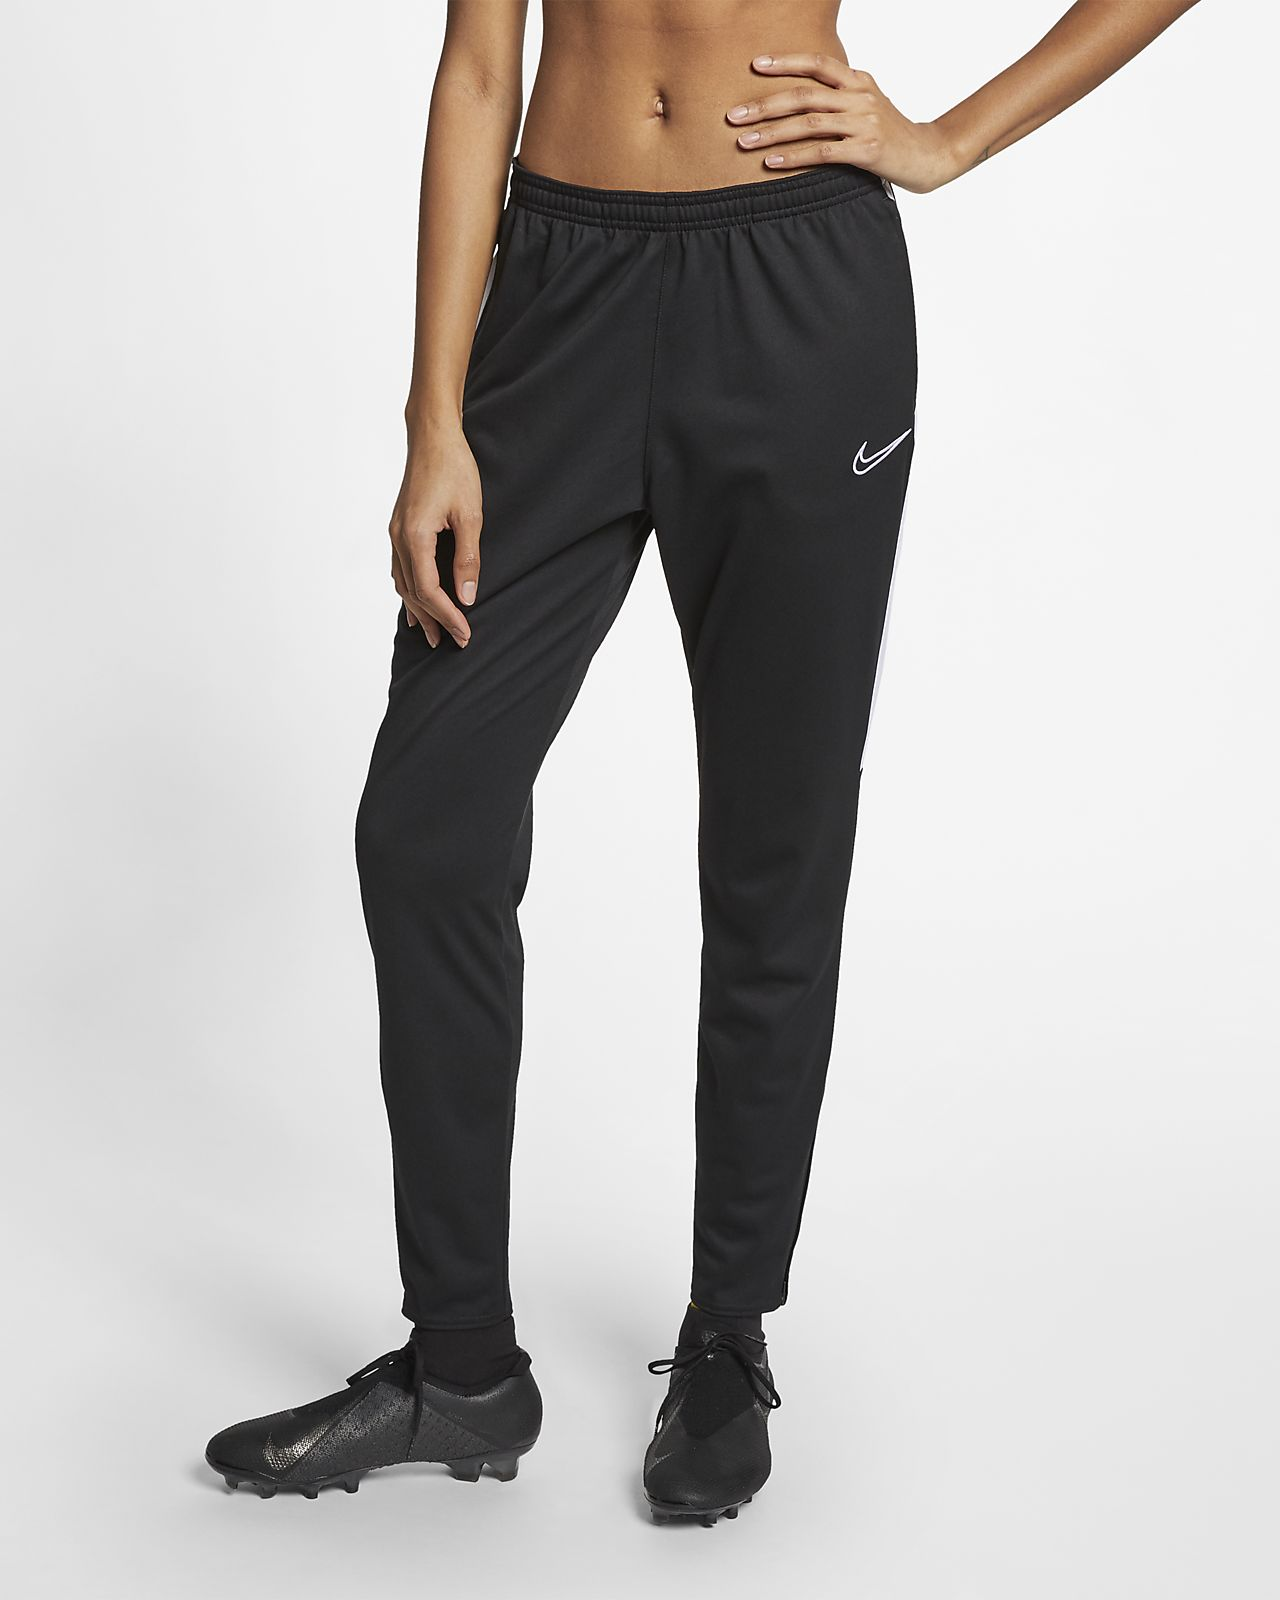 Nike Dri-FIT Academy Damen-Fußballhose